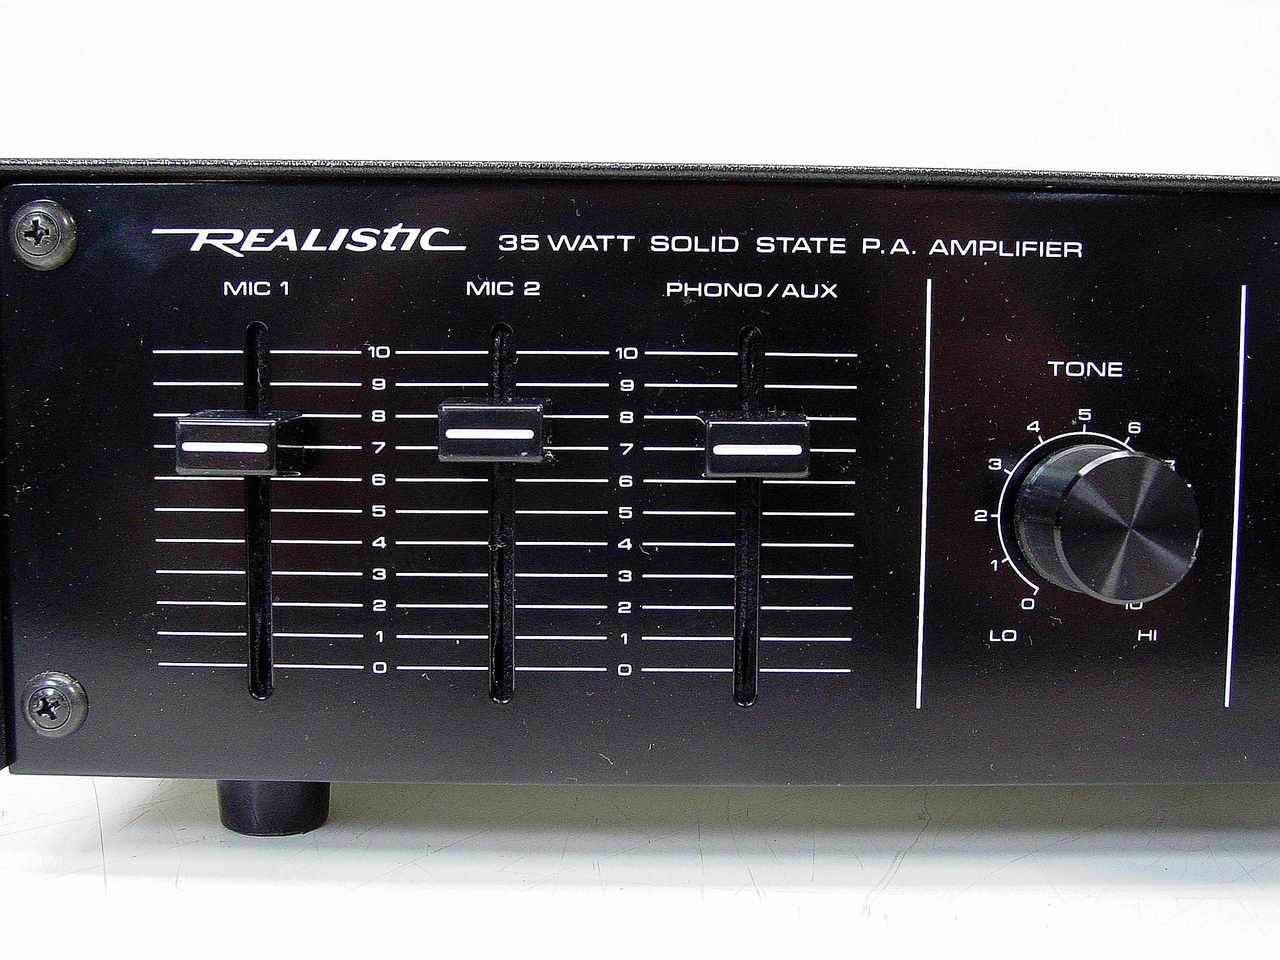 Realistic 32 2027 Mpa 35a 35 Watt Solid State Pa Amplifier